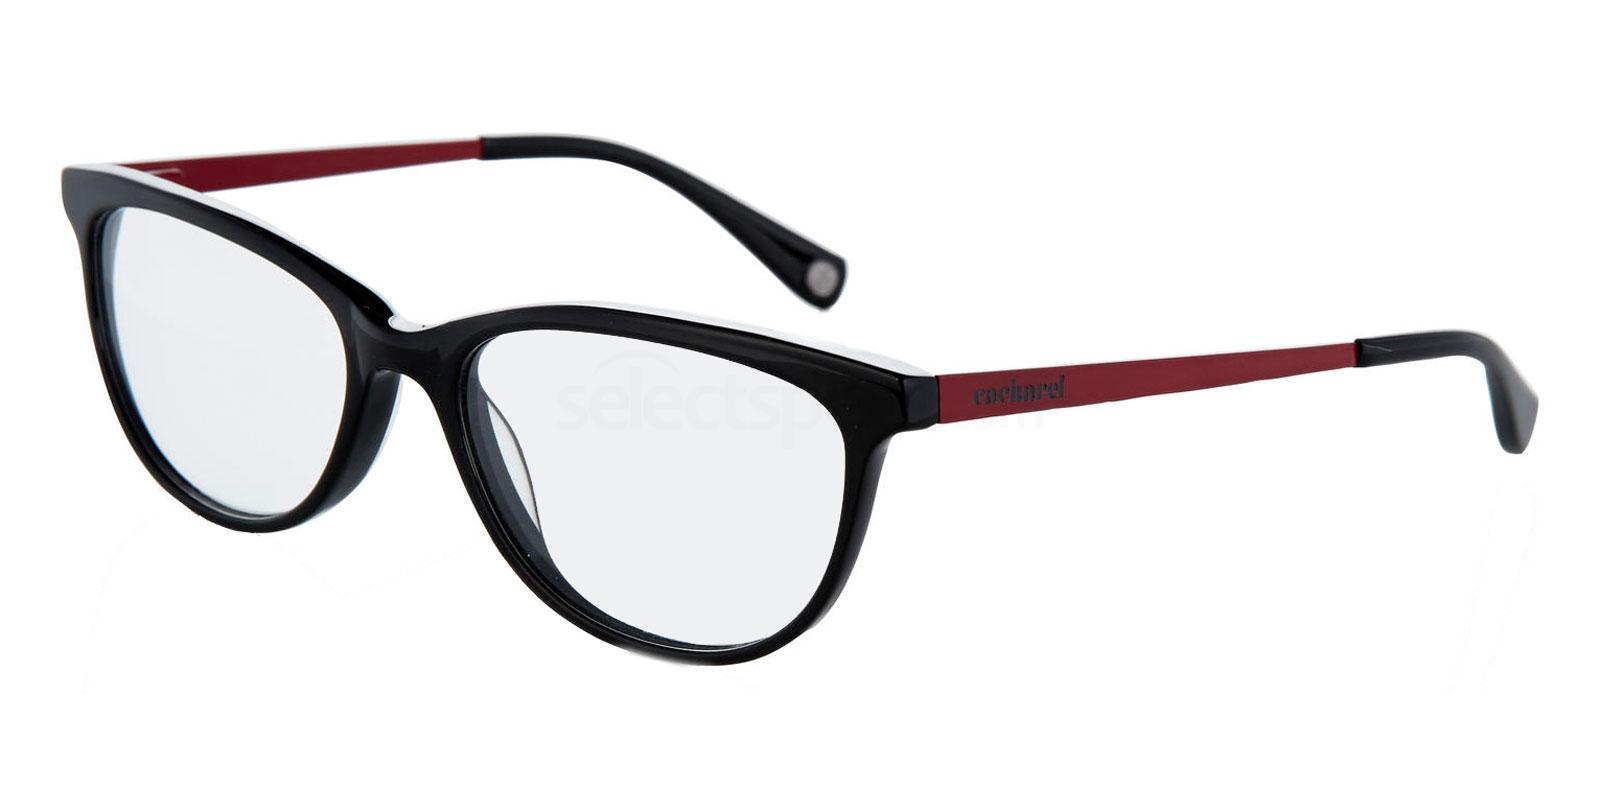 001 CA3025 Glasses, Cacharel